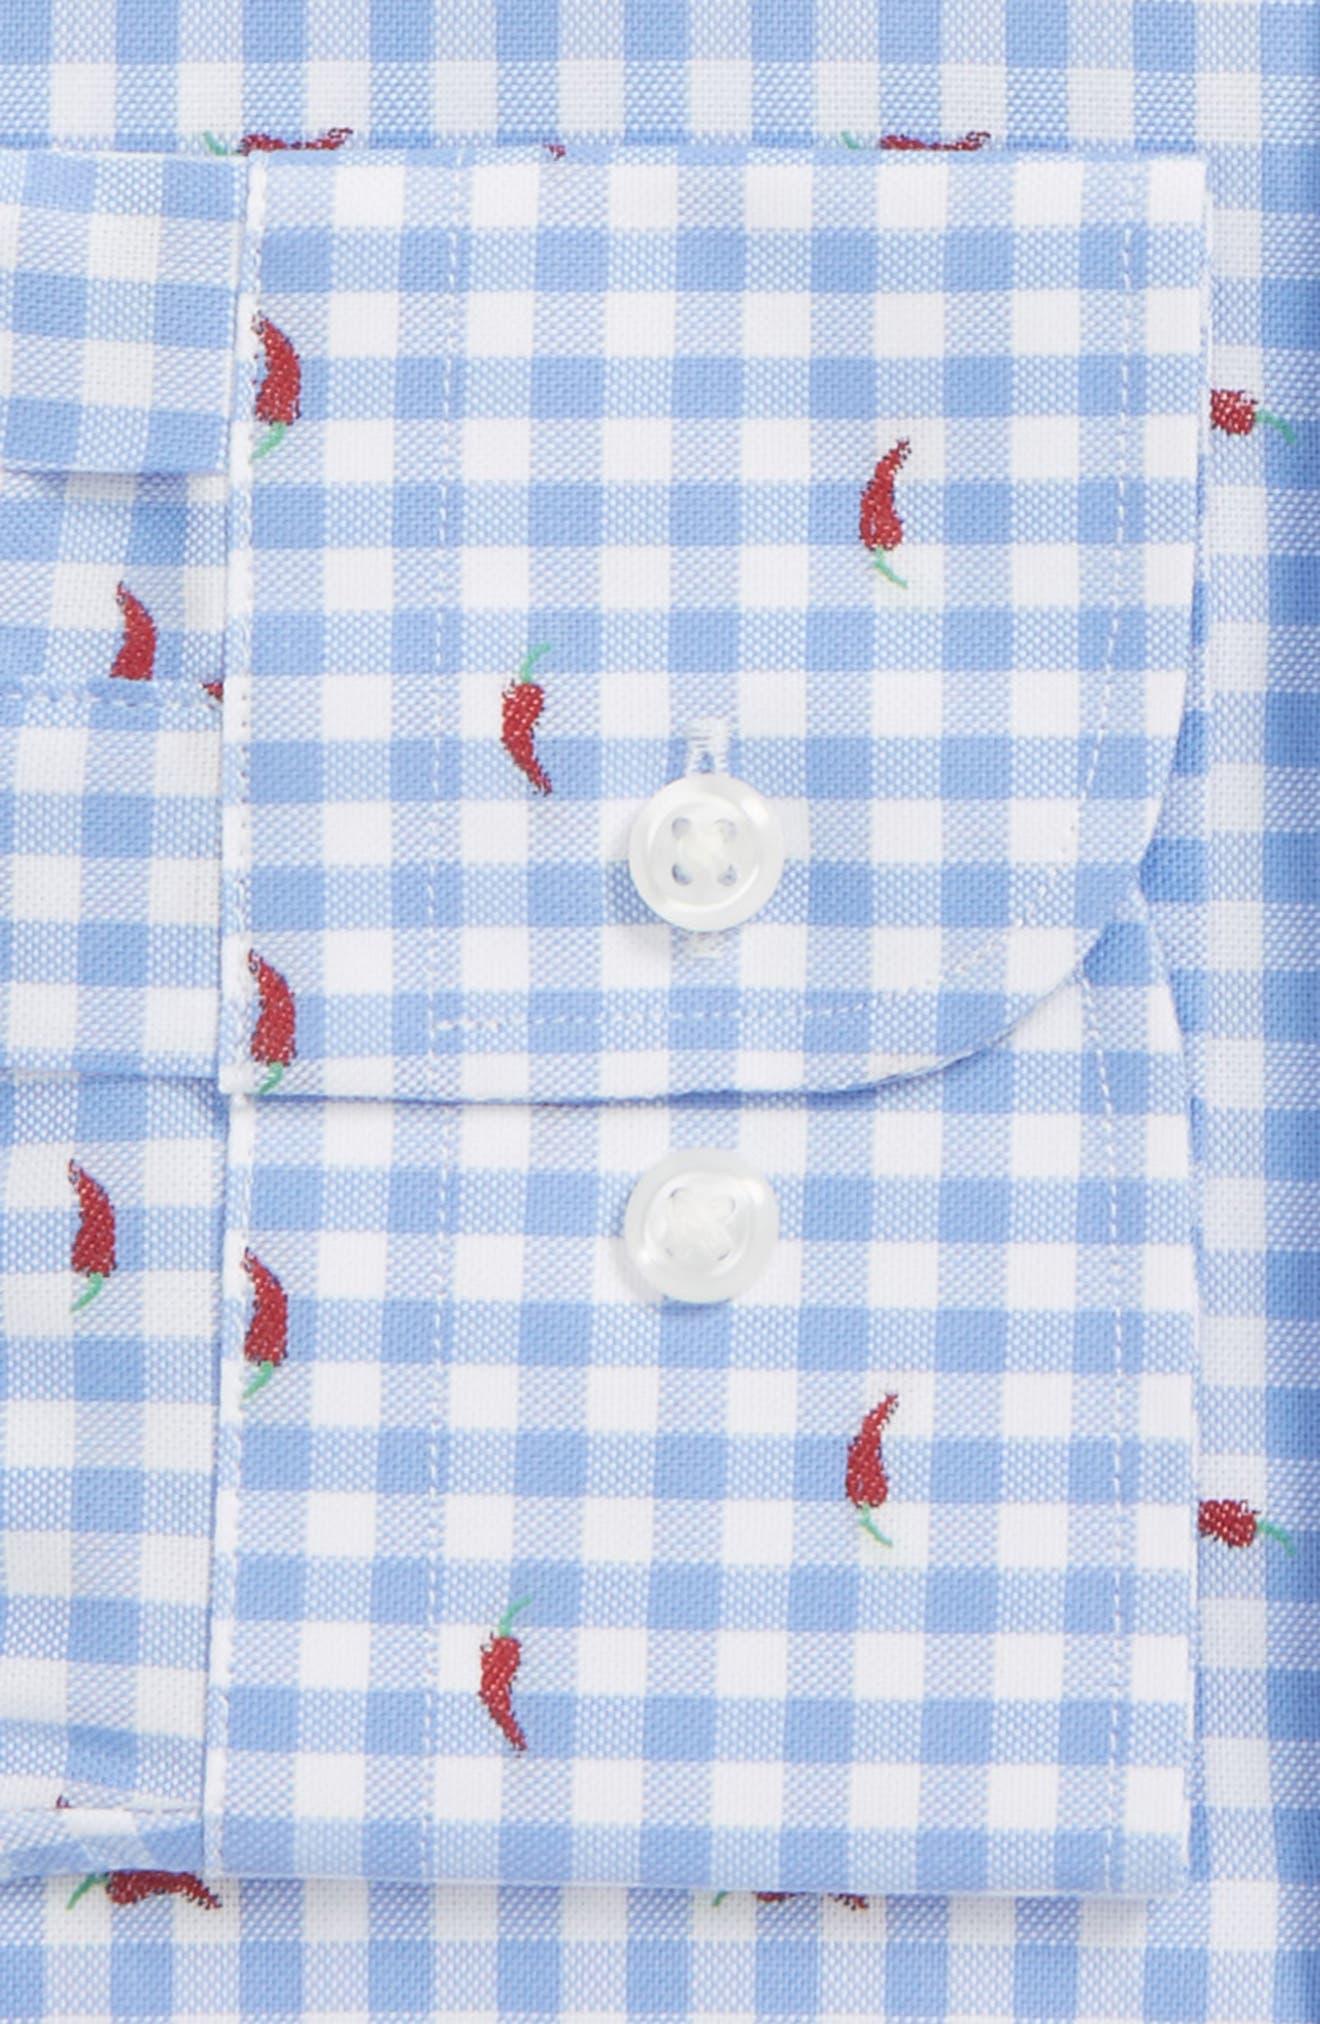 Trim Fit Gingham Chili Pepper Dress Shirt,                             Alternate thumbnail 6, color,